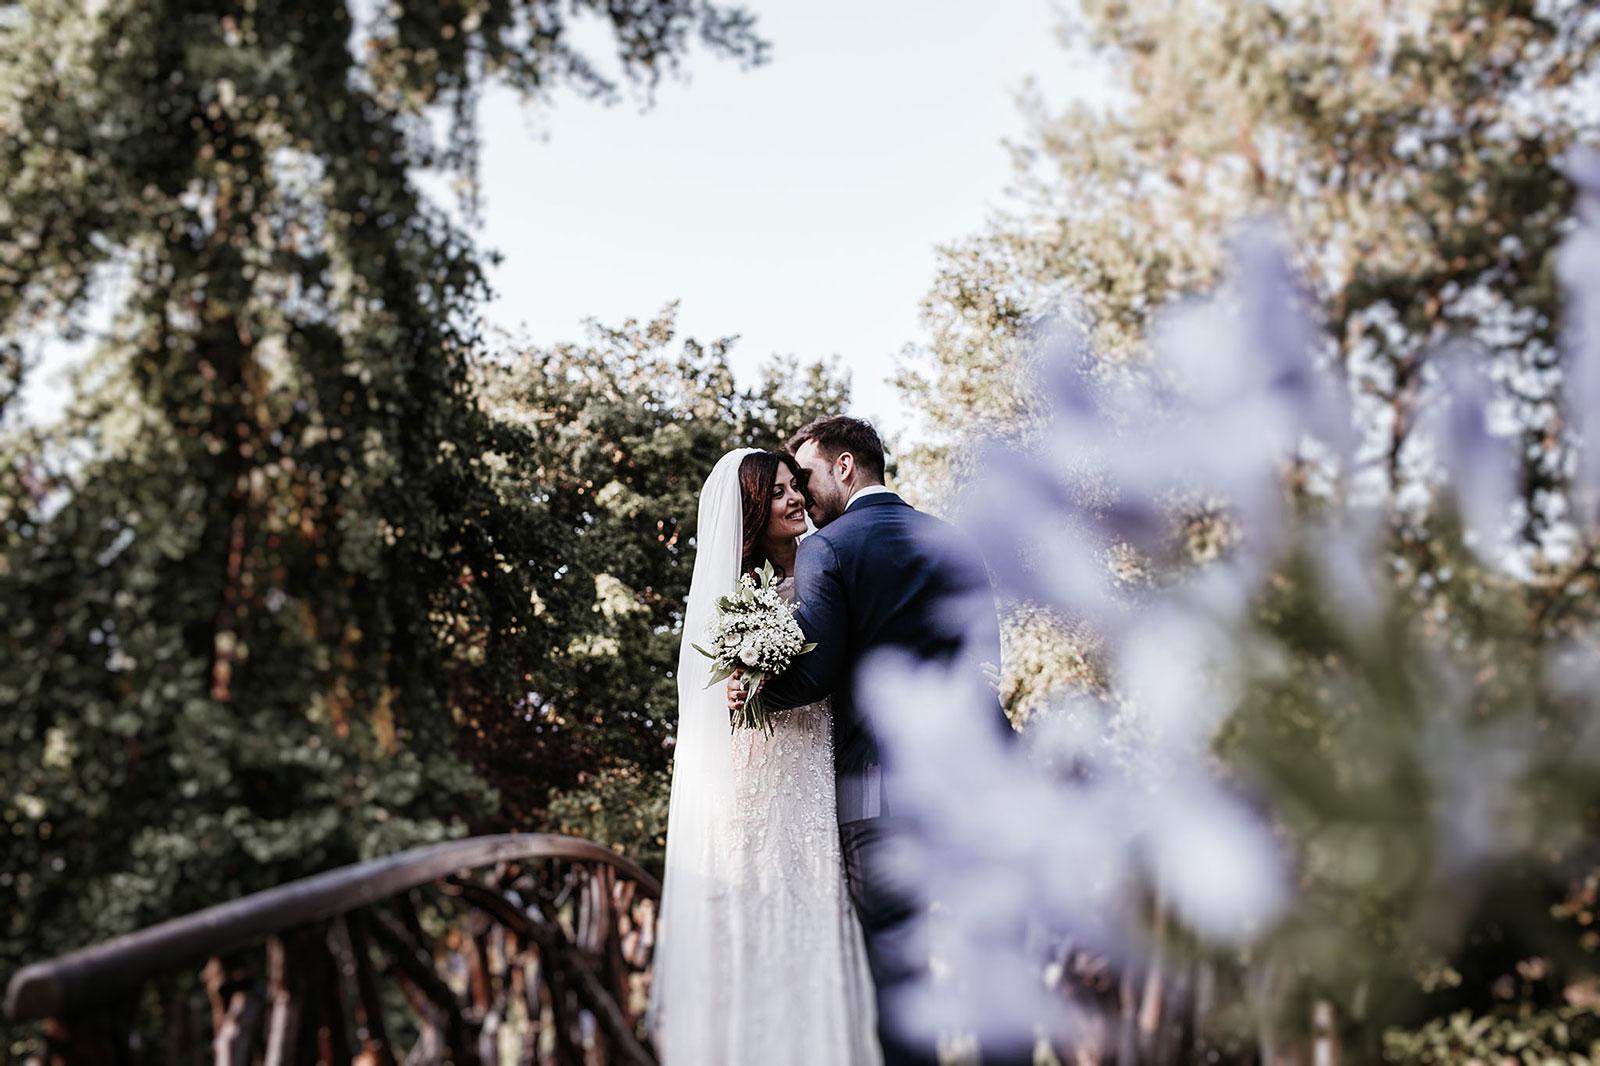 Matrimonio al Borgo Seghetti Panichi - Wedding at Borgo Seghetti Panichi